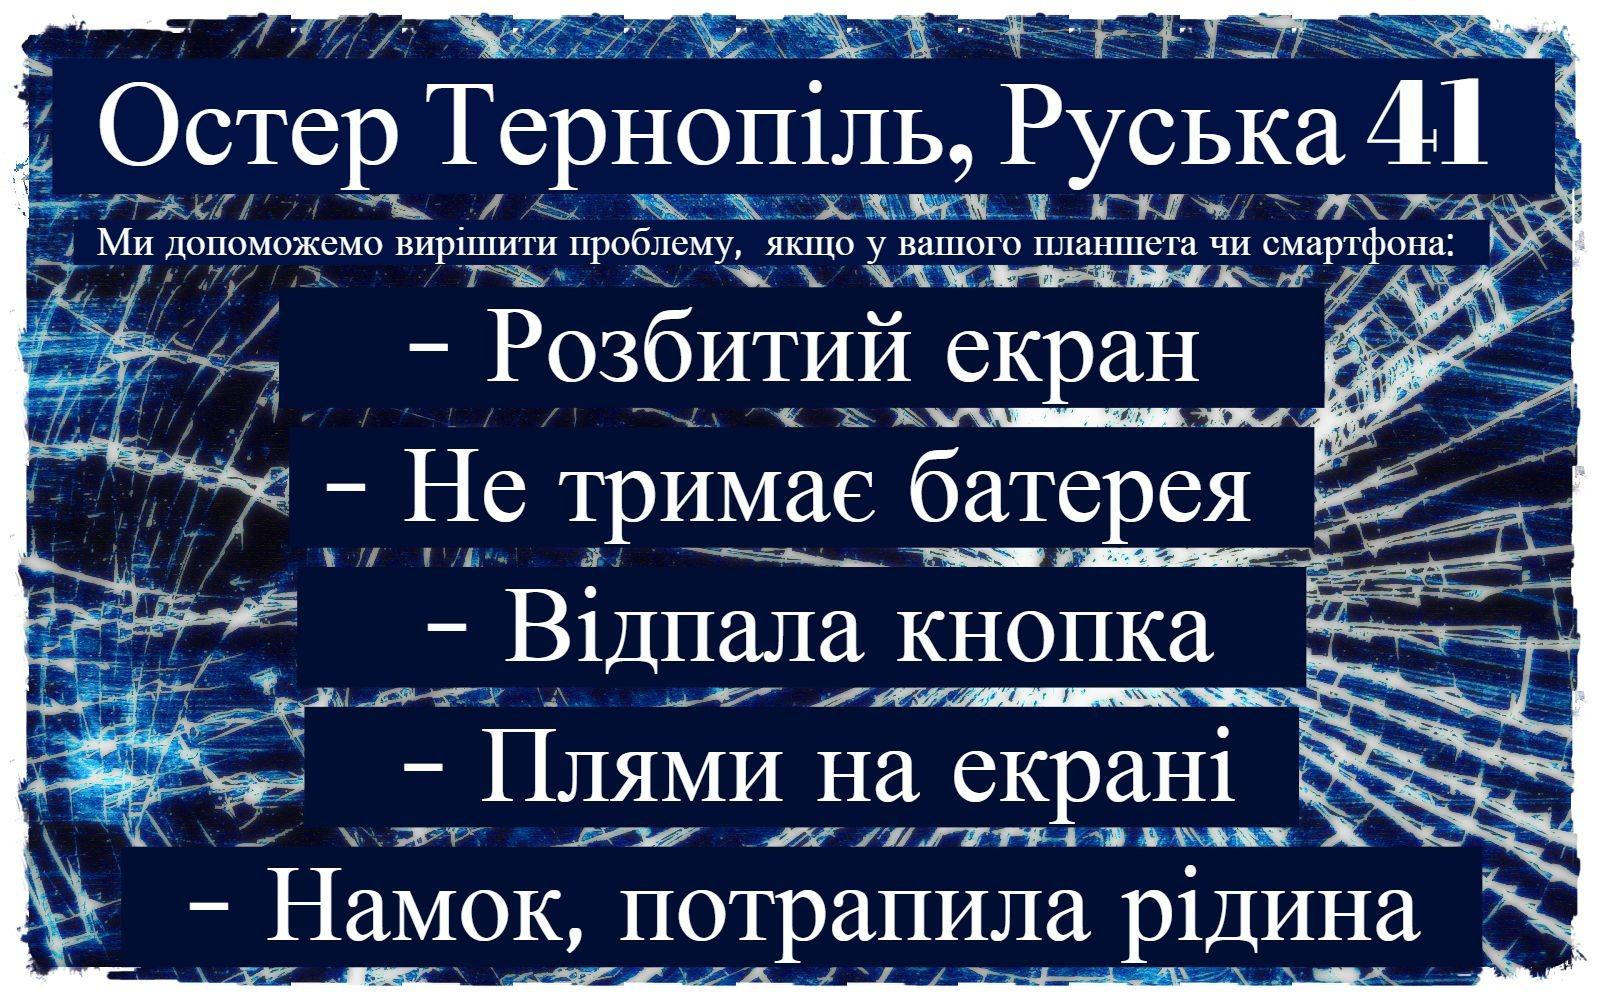 Ремонт планшета, ремонт смартфона Тернопіль